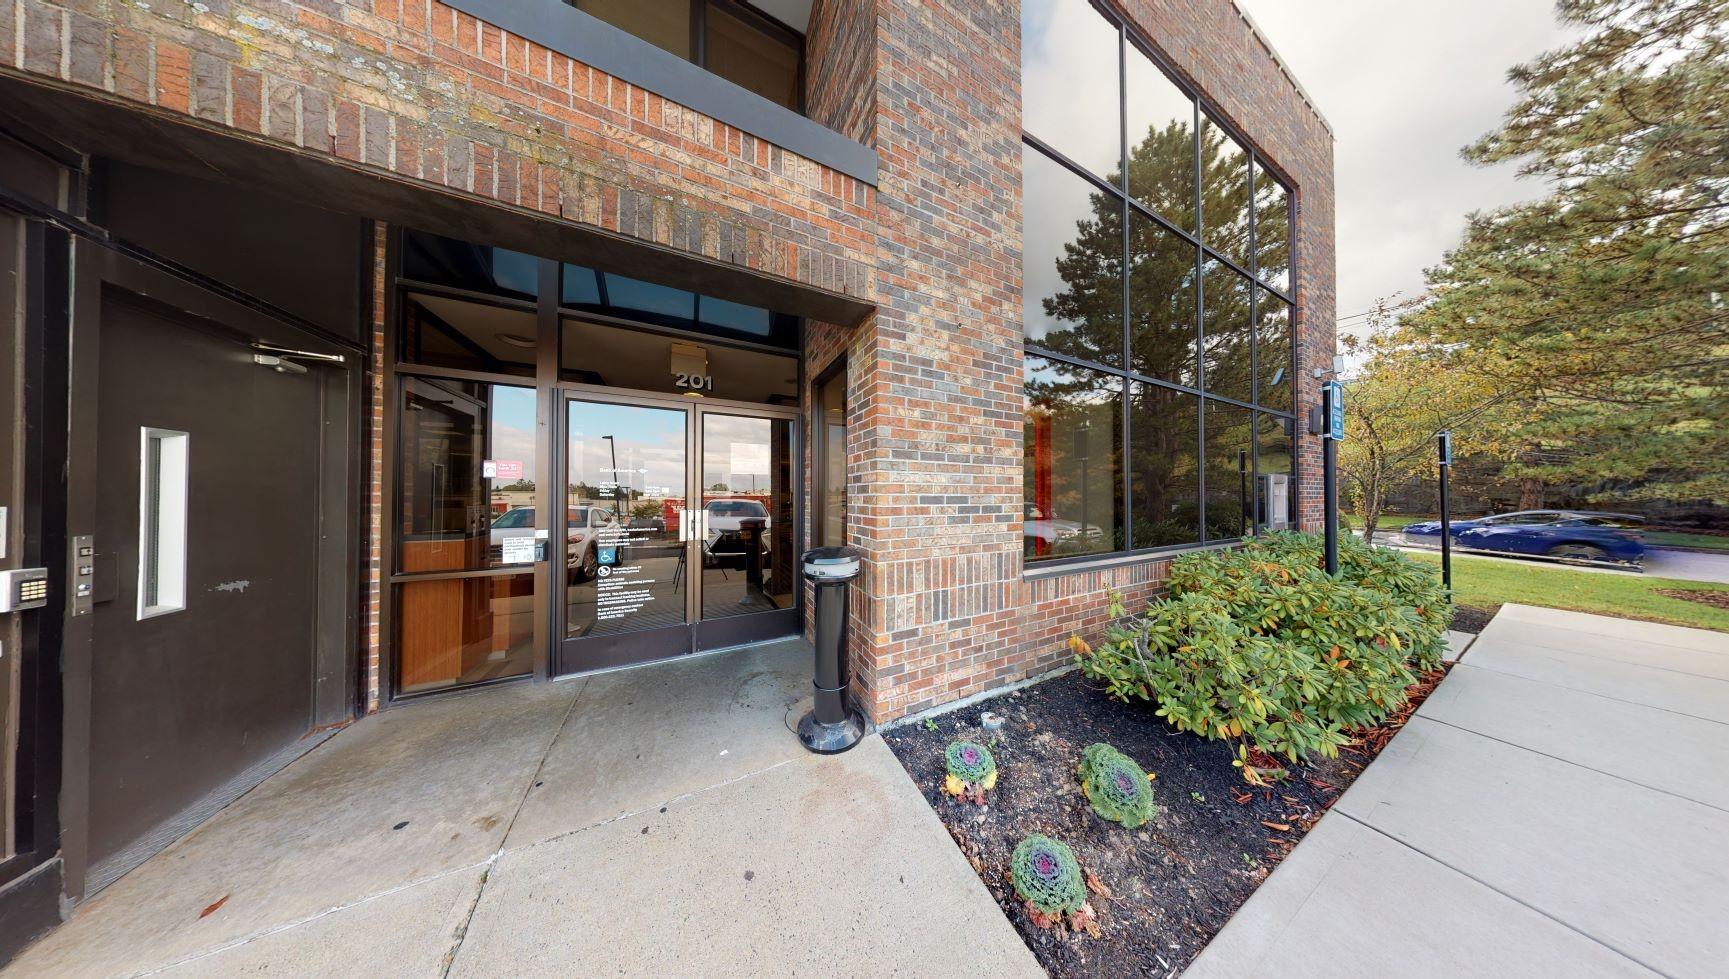 Bank of America financial center with drive-thru ATM | 201 Hillside Rd, Cranston, RI 02920